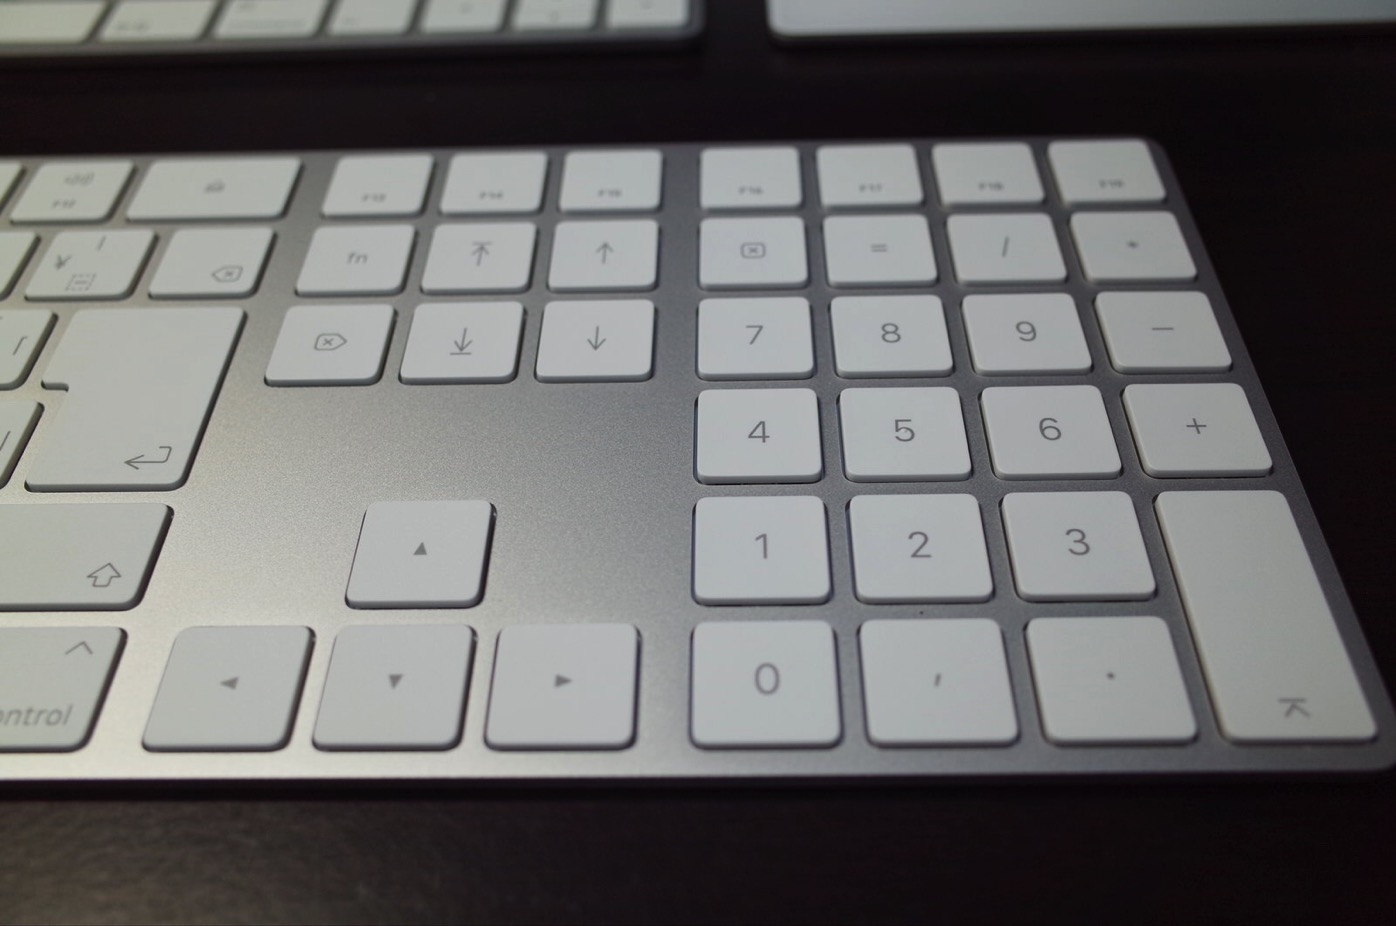 Magic Keyboard(テンキー付き)- 日本語(JIS)-5